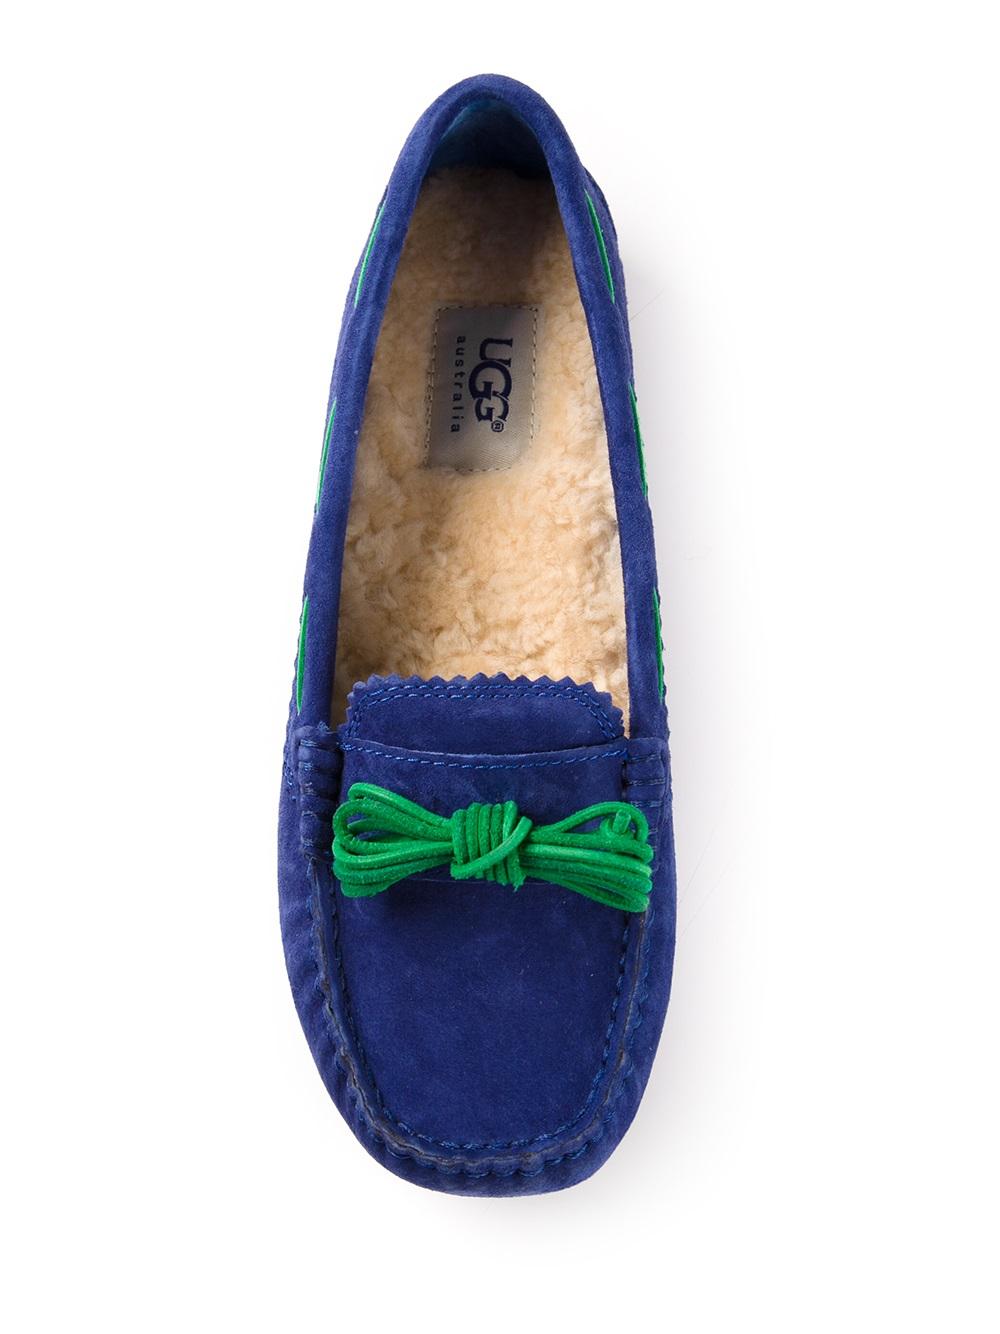 Lyst Ugg Meena Slippers In Green